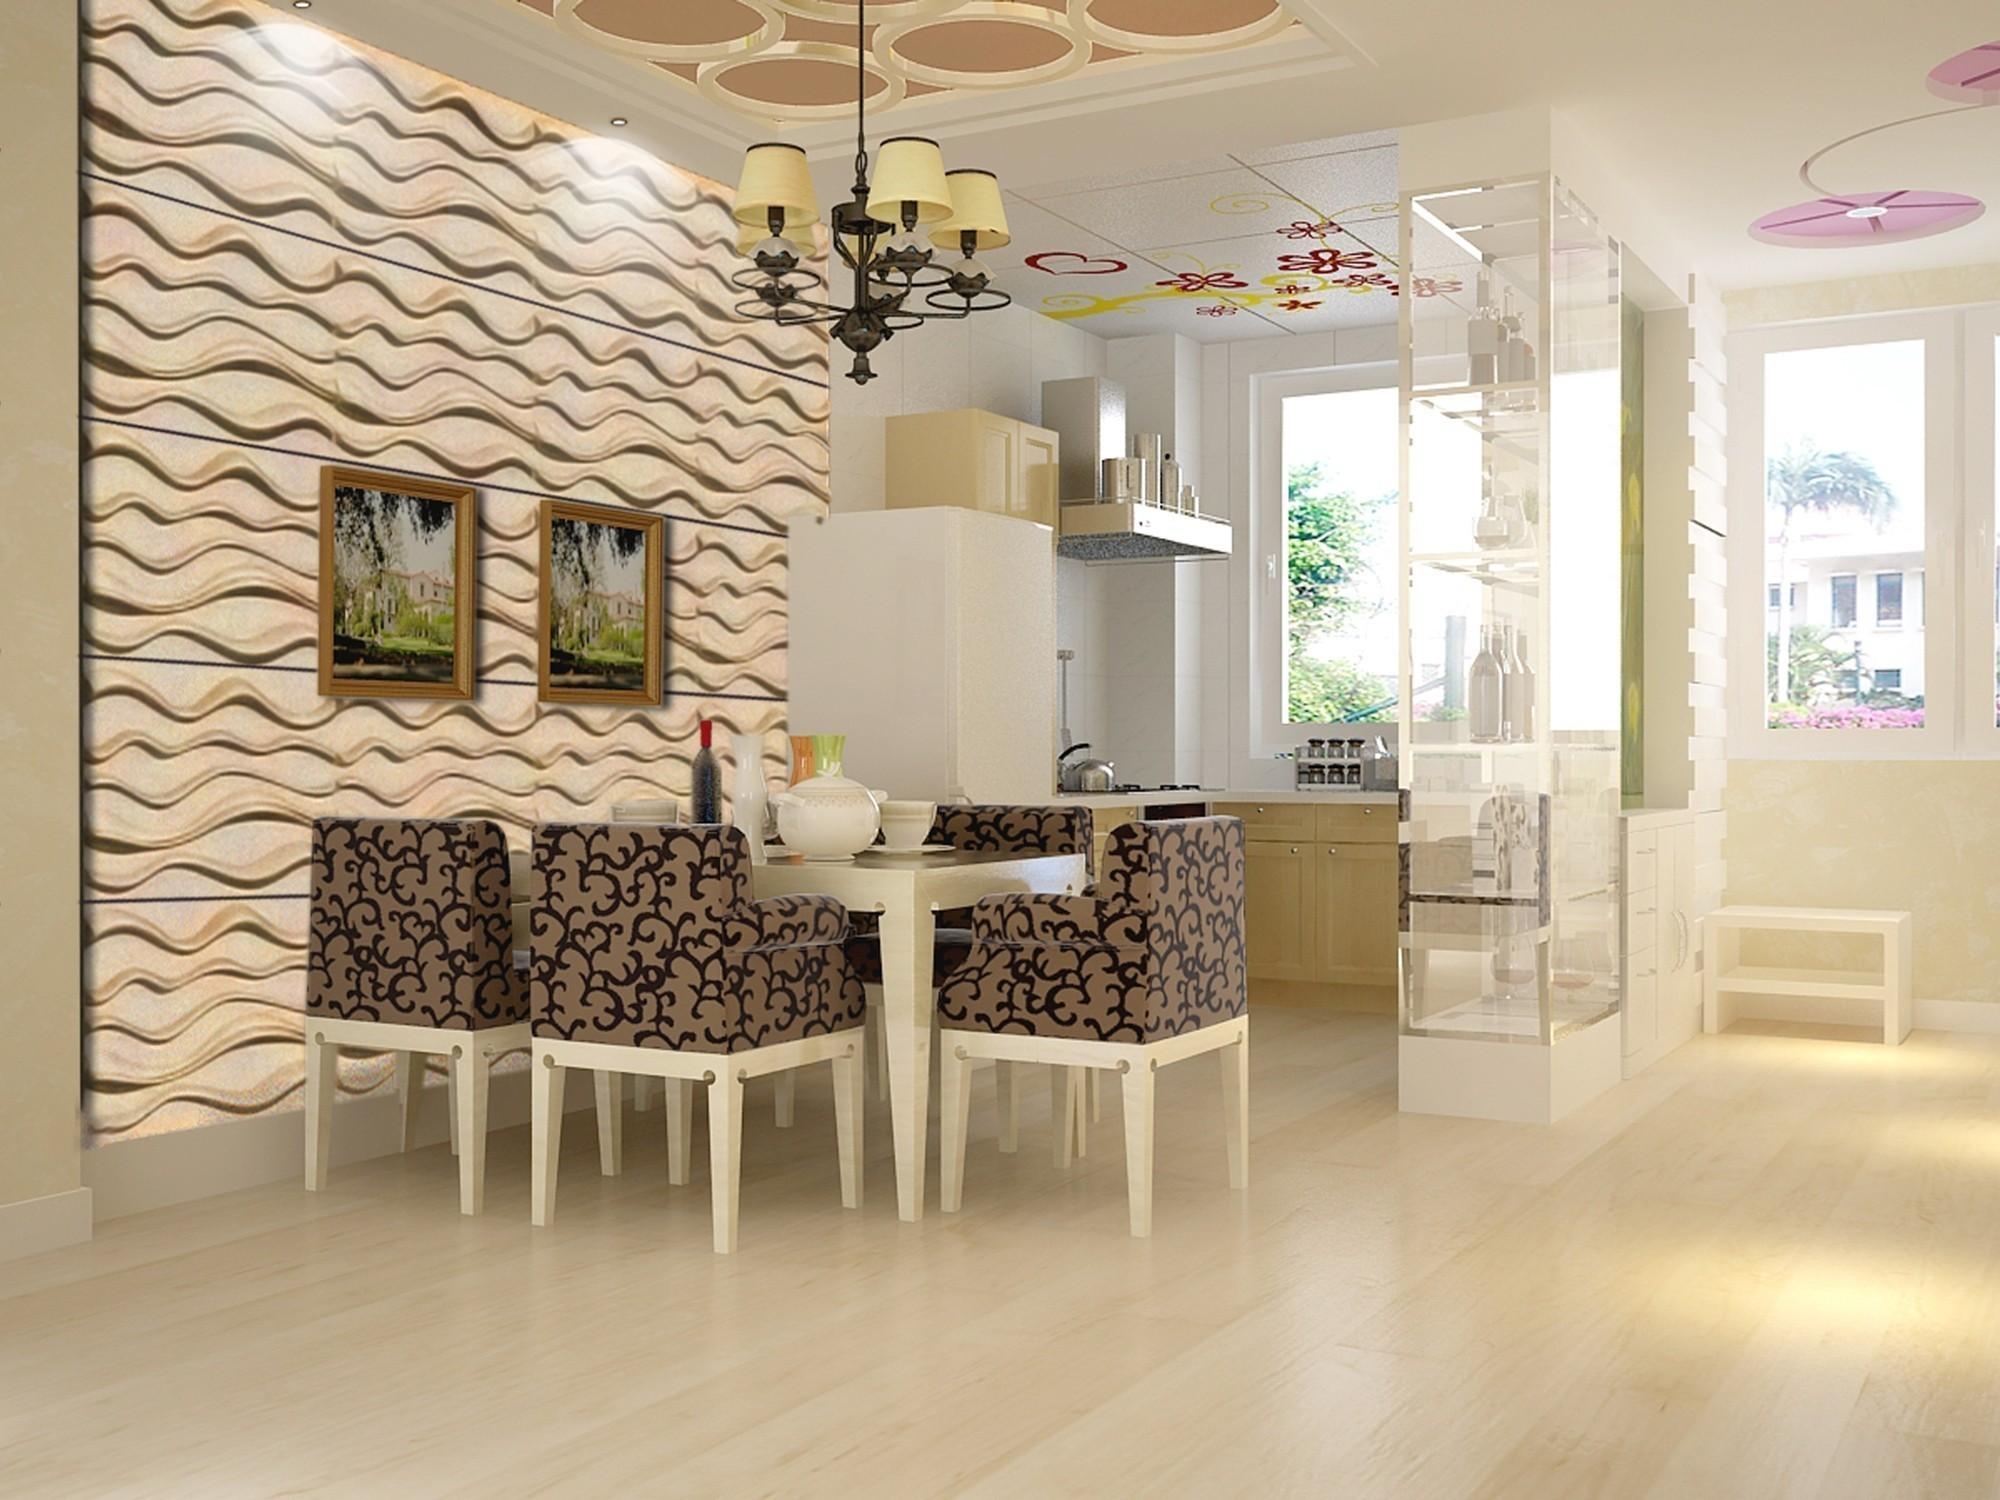 50 m2 paneele 3d platten wandverkleidung wanddekor innendekor 62x80cm camille sparpakete 3d. Black Bedroom Furniture Sets. Home Design Ideas